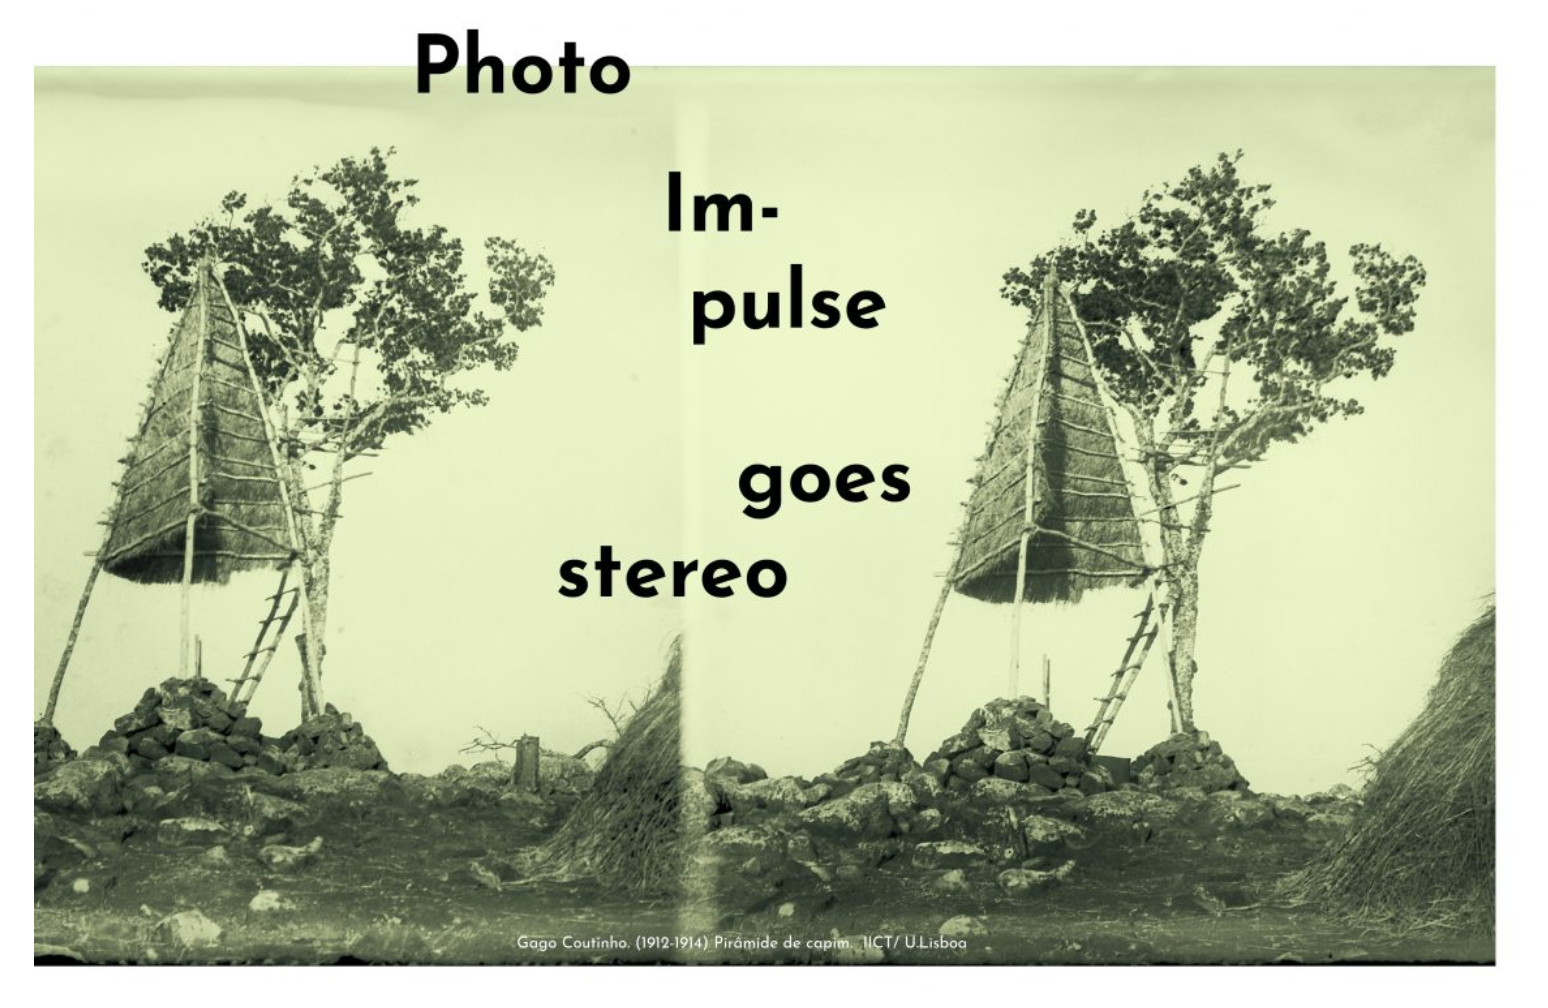 Conference on Stereo Photography   ICNOVA NOVA FCSH